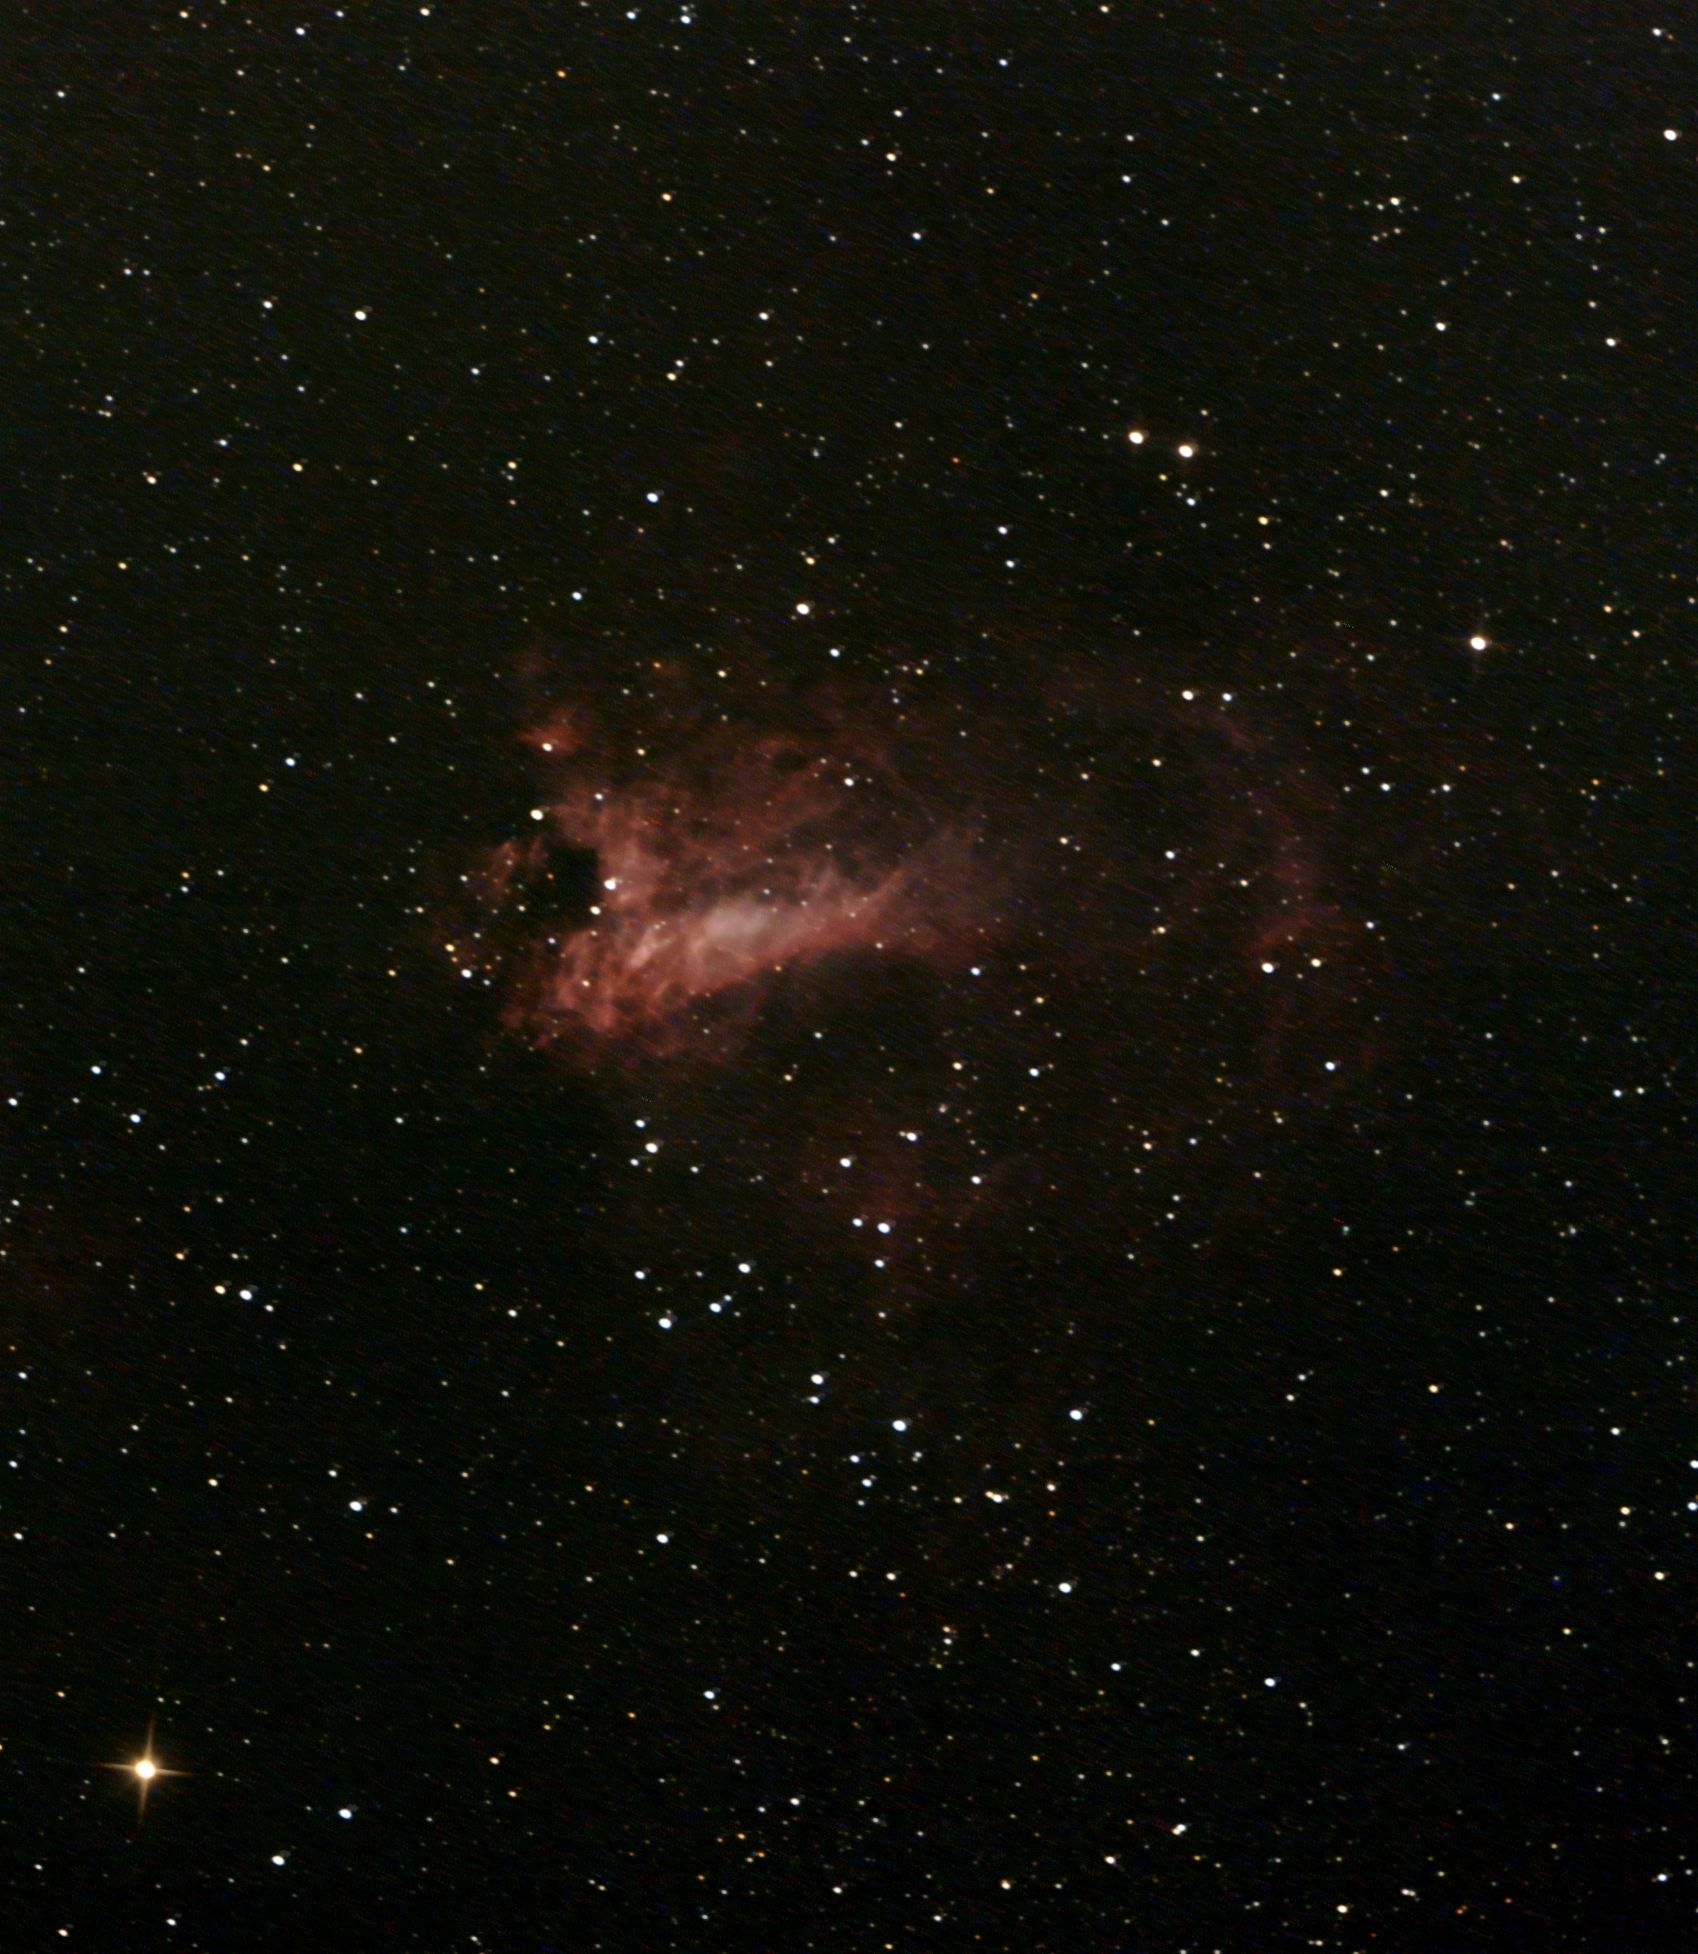 omega nebula 8 inch telescope - HD1698×1954